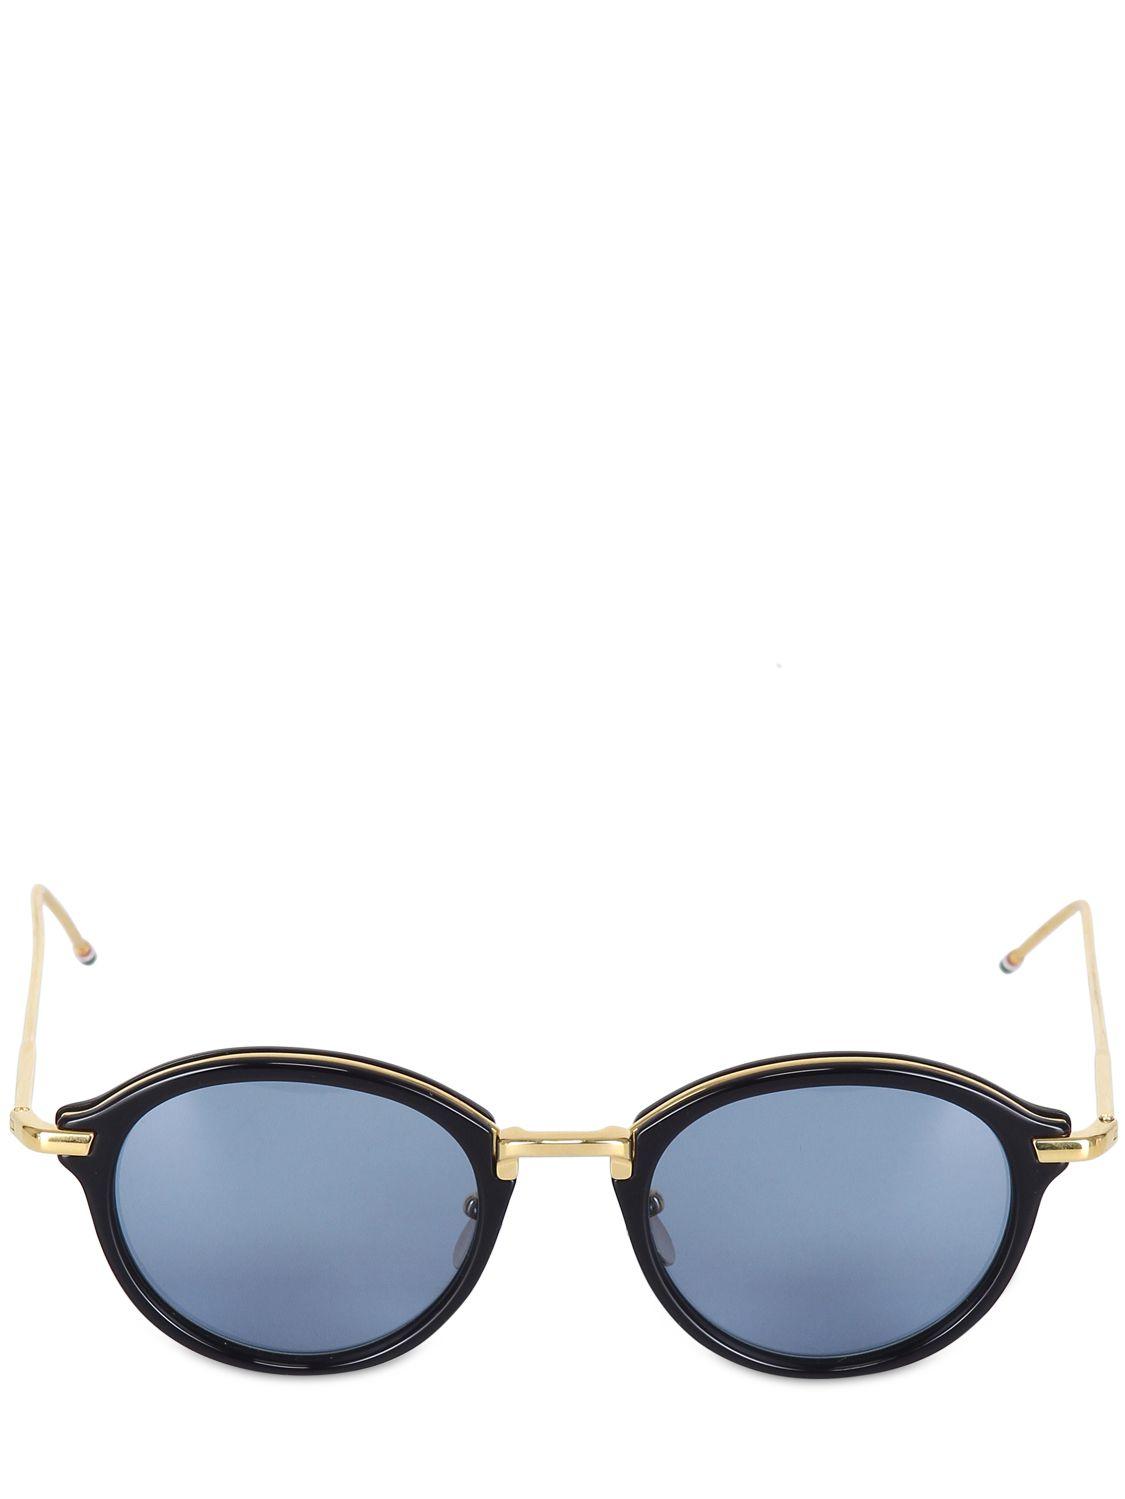 efef9a6404 Ray Ban Rb4176 Sunglasses Shiny Black Frame Deep Green Polarized ...